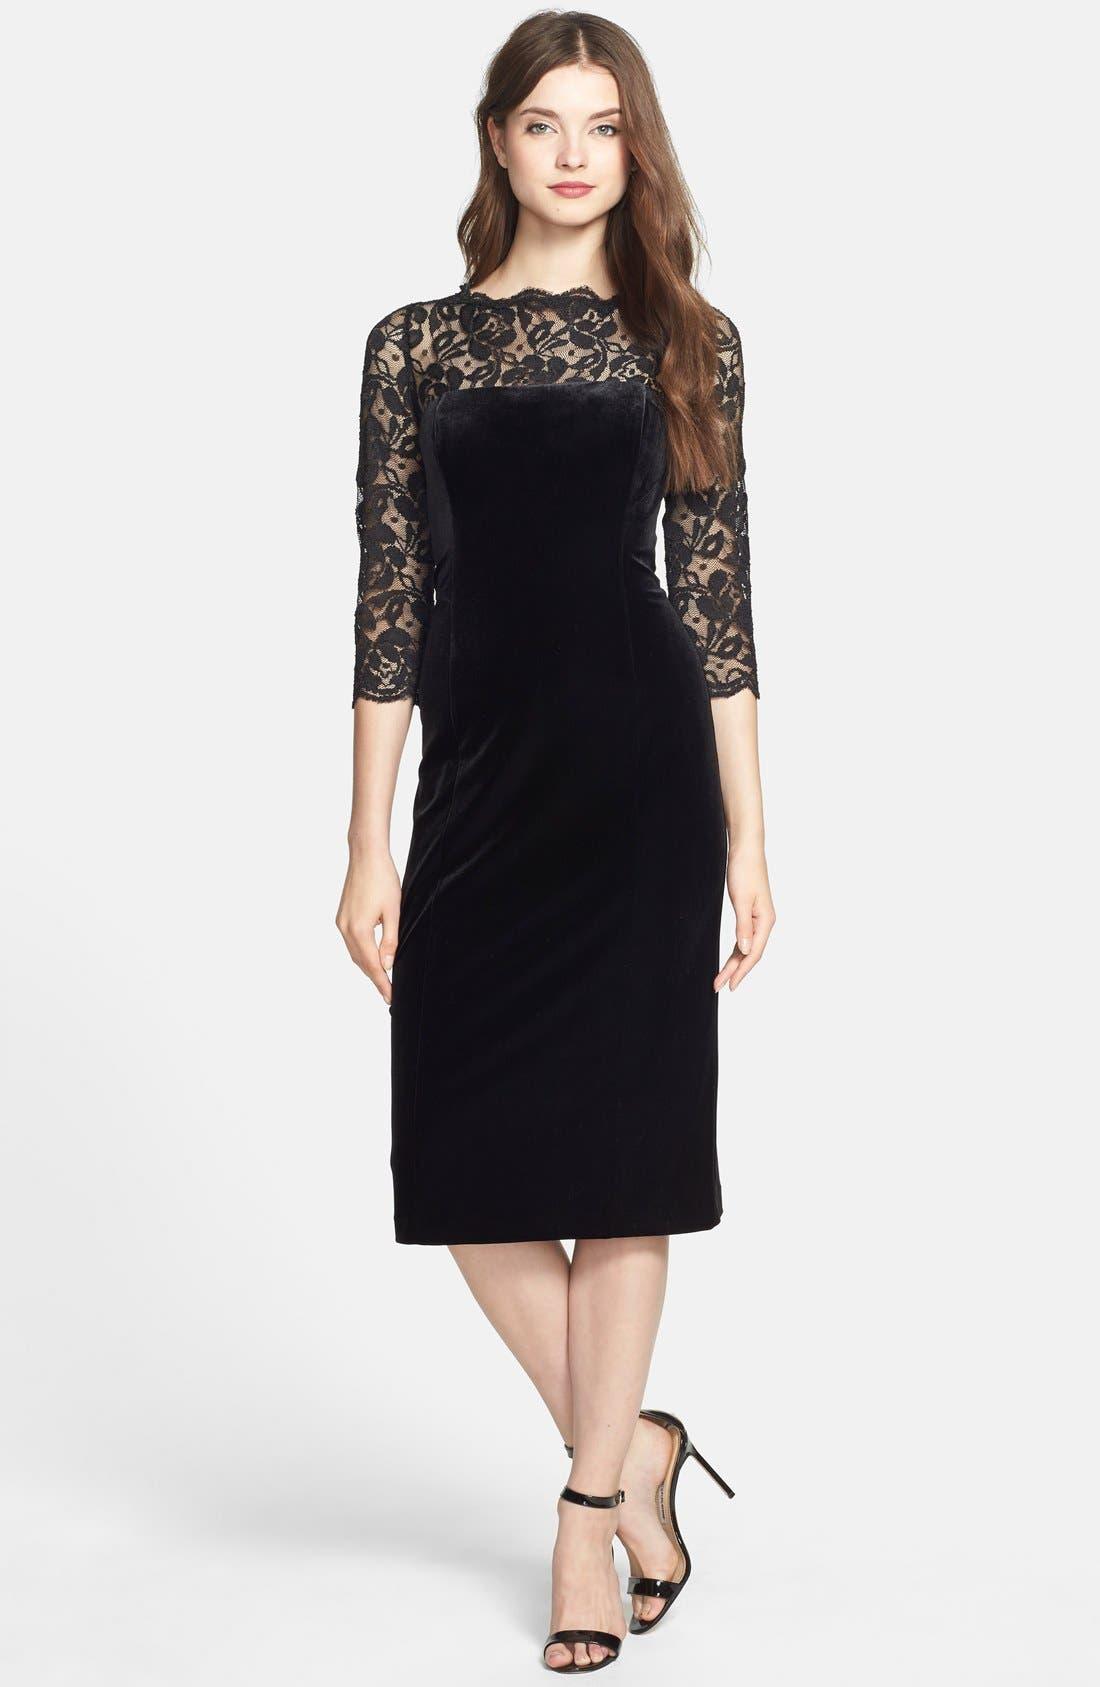 Women's Lace Cocktail & Party Dresses | Nordstrom